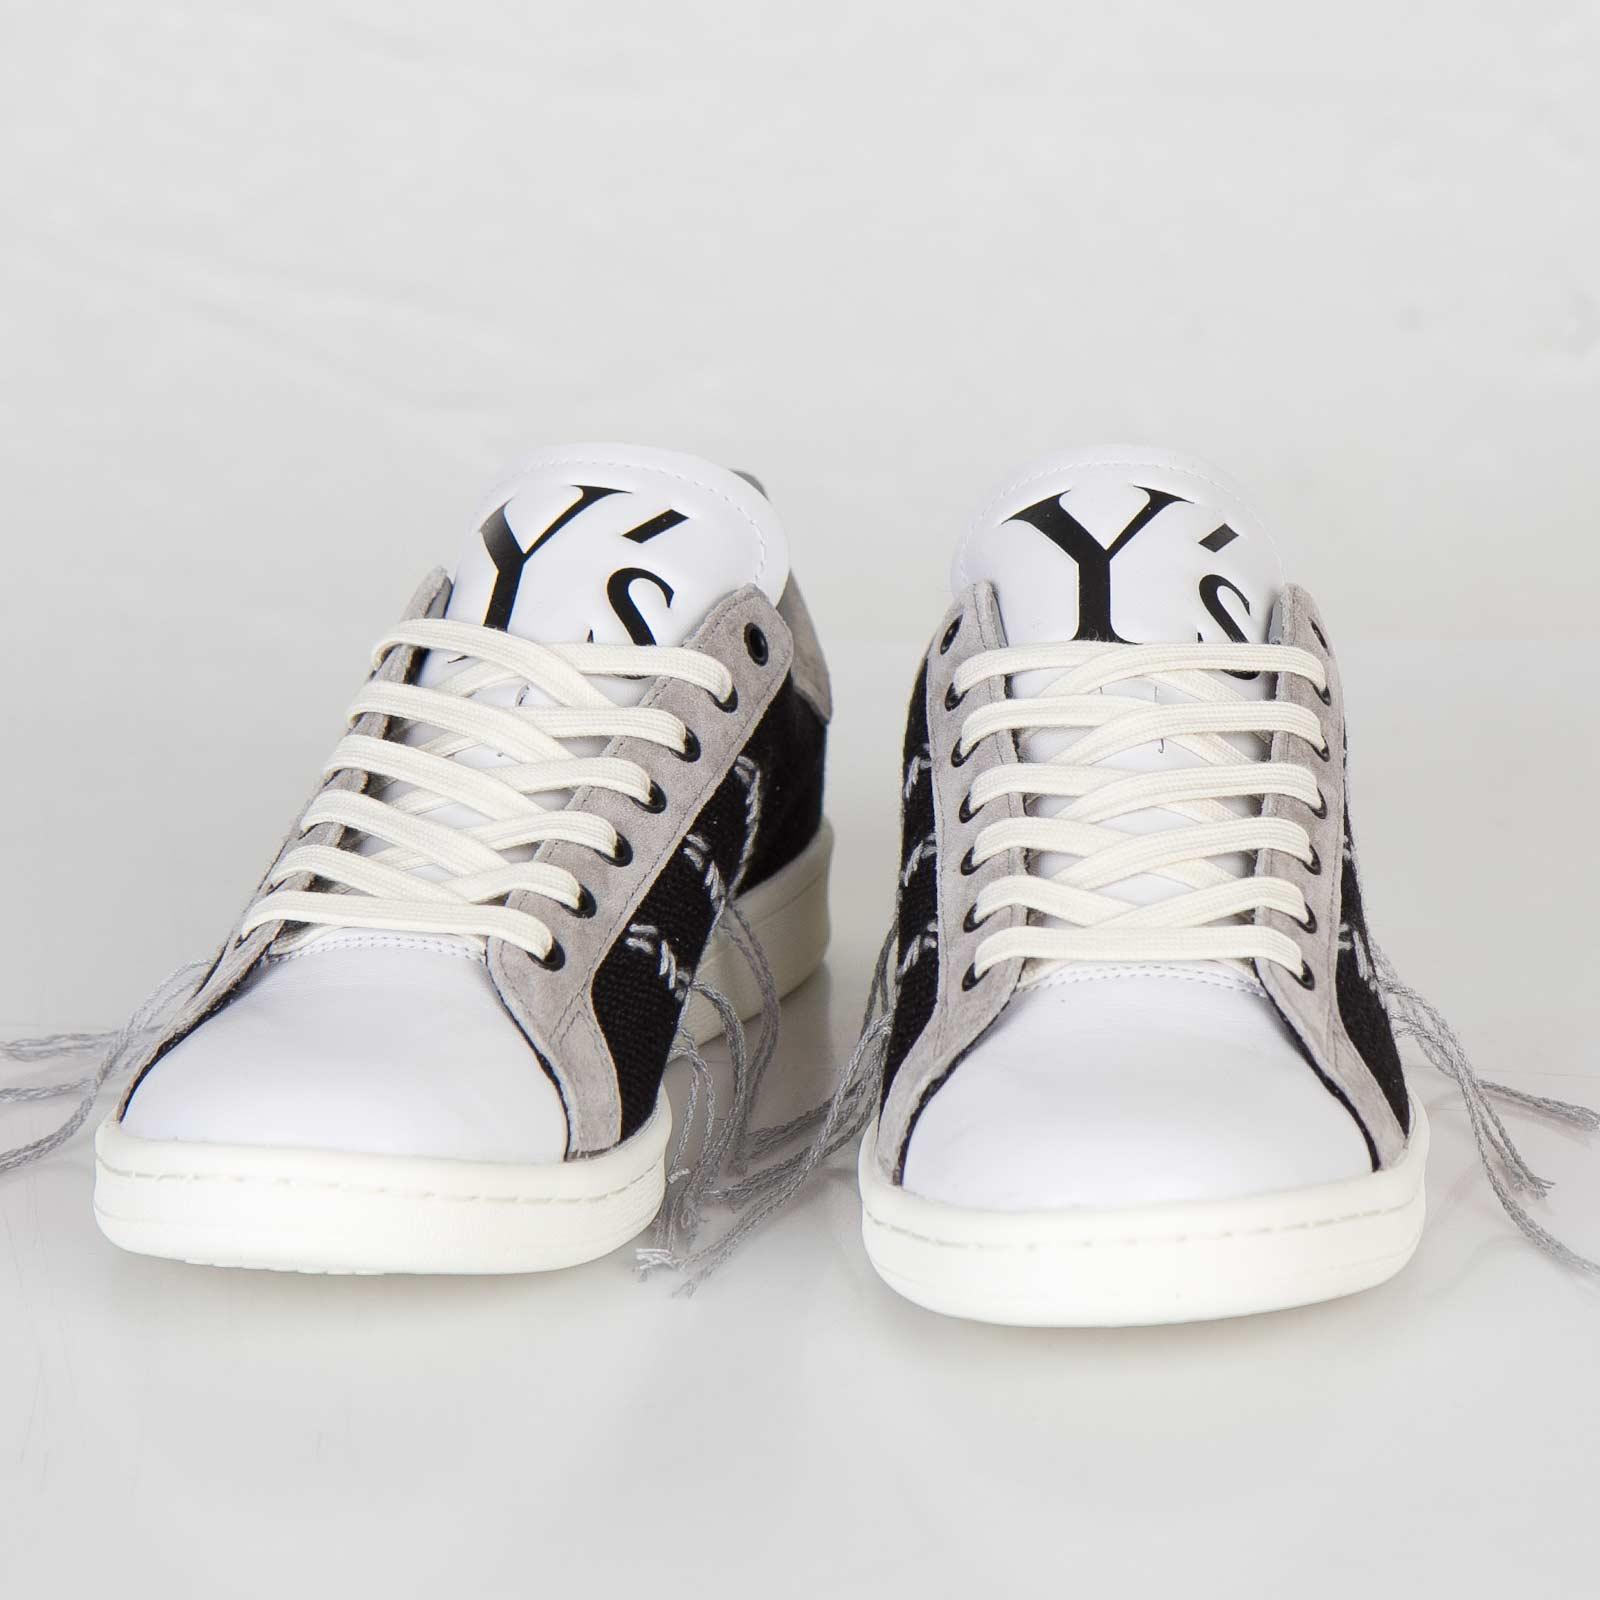 038446a7a australia adidas stan smith consortium ys by yohji yamamoto 02ef4 65a64